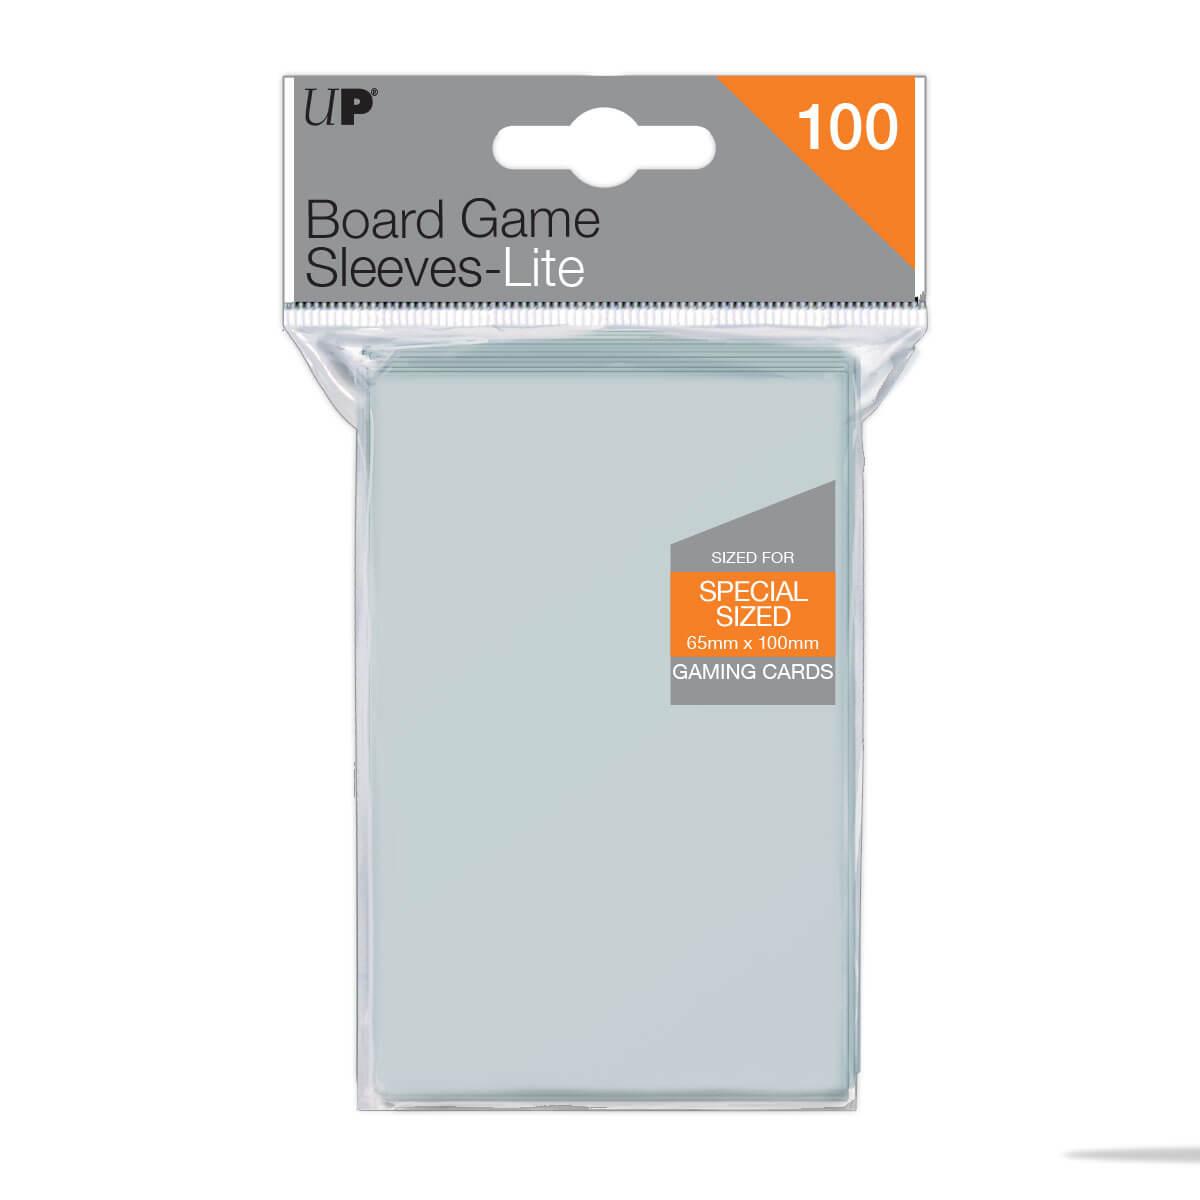 Lite Board Game Sleeves 65mm x 100mm 100ct